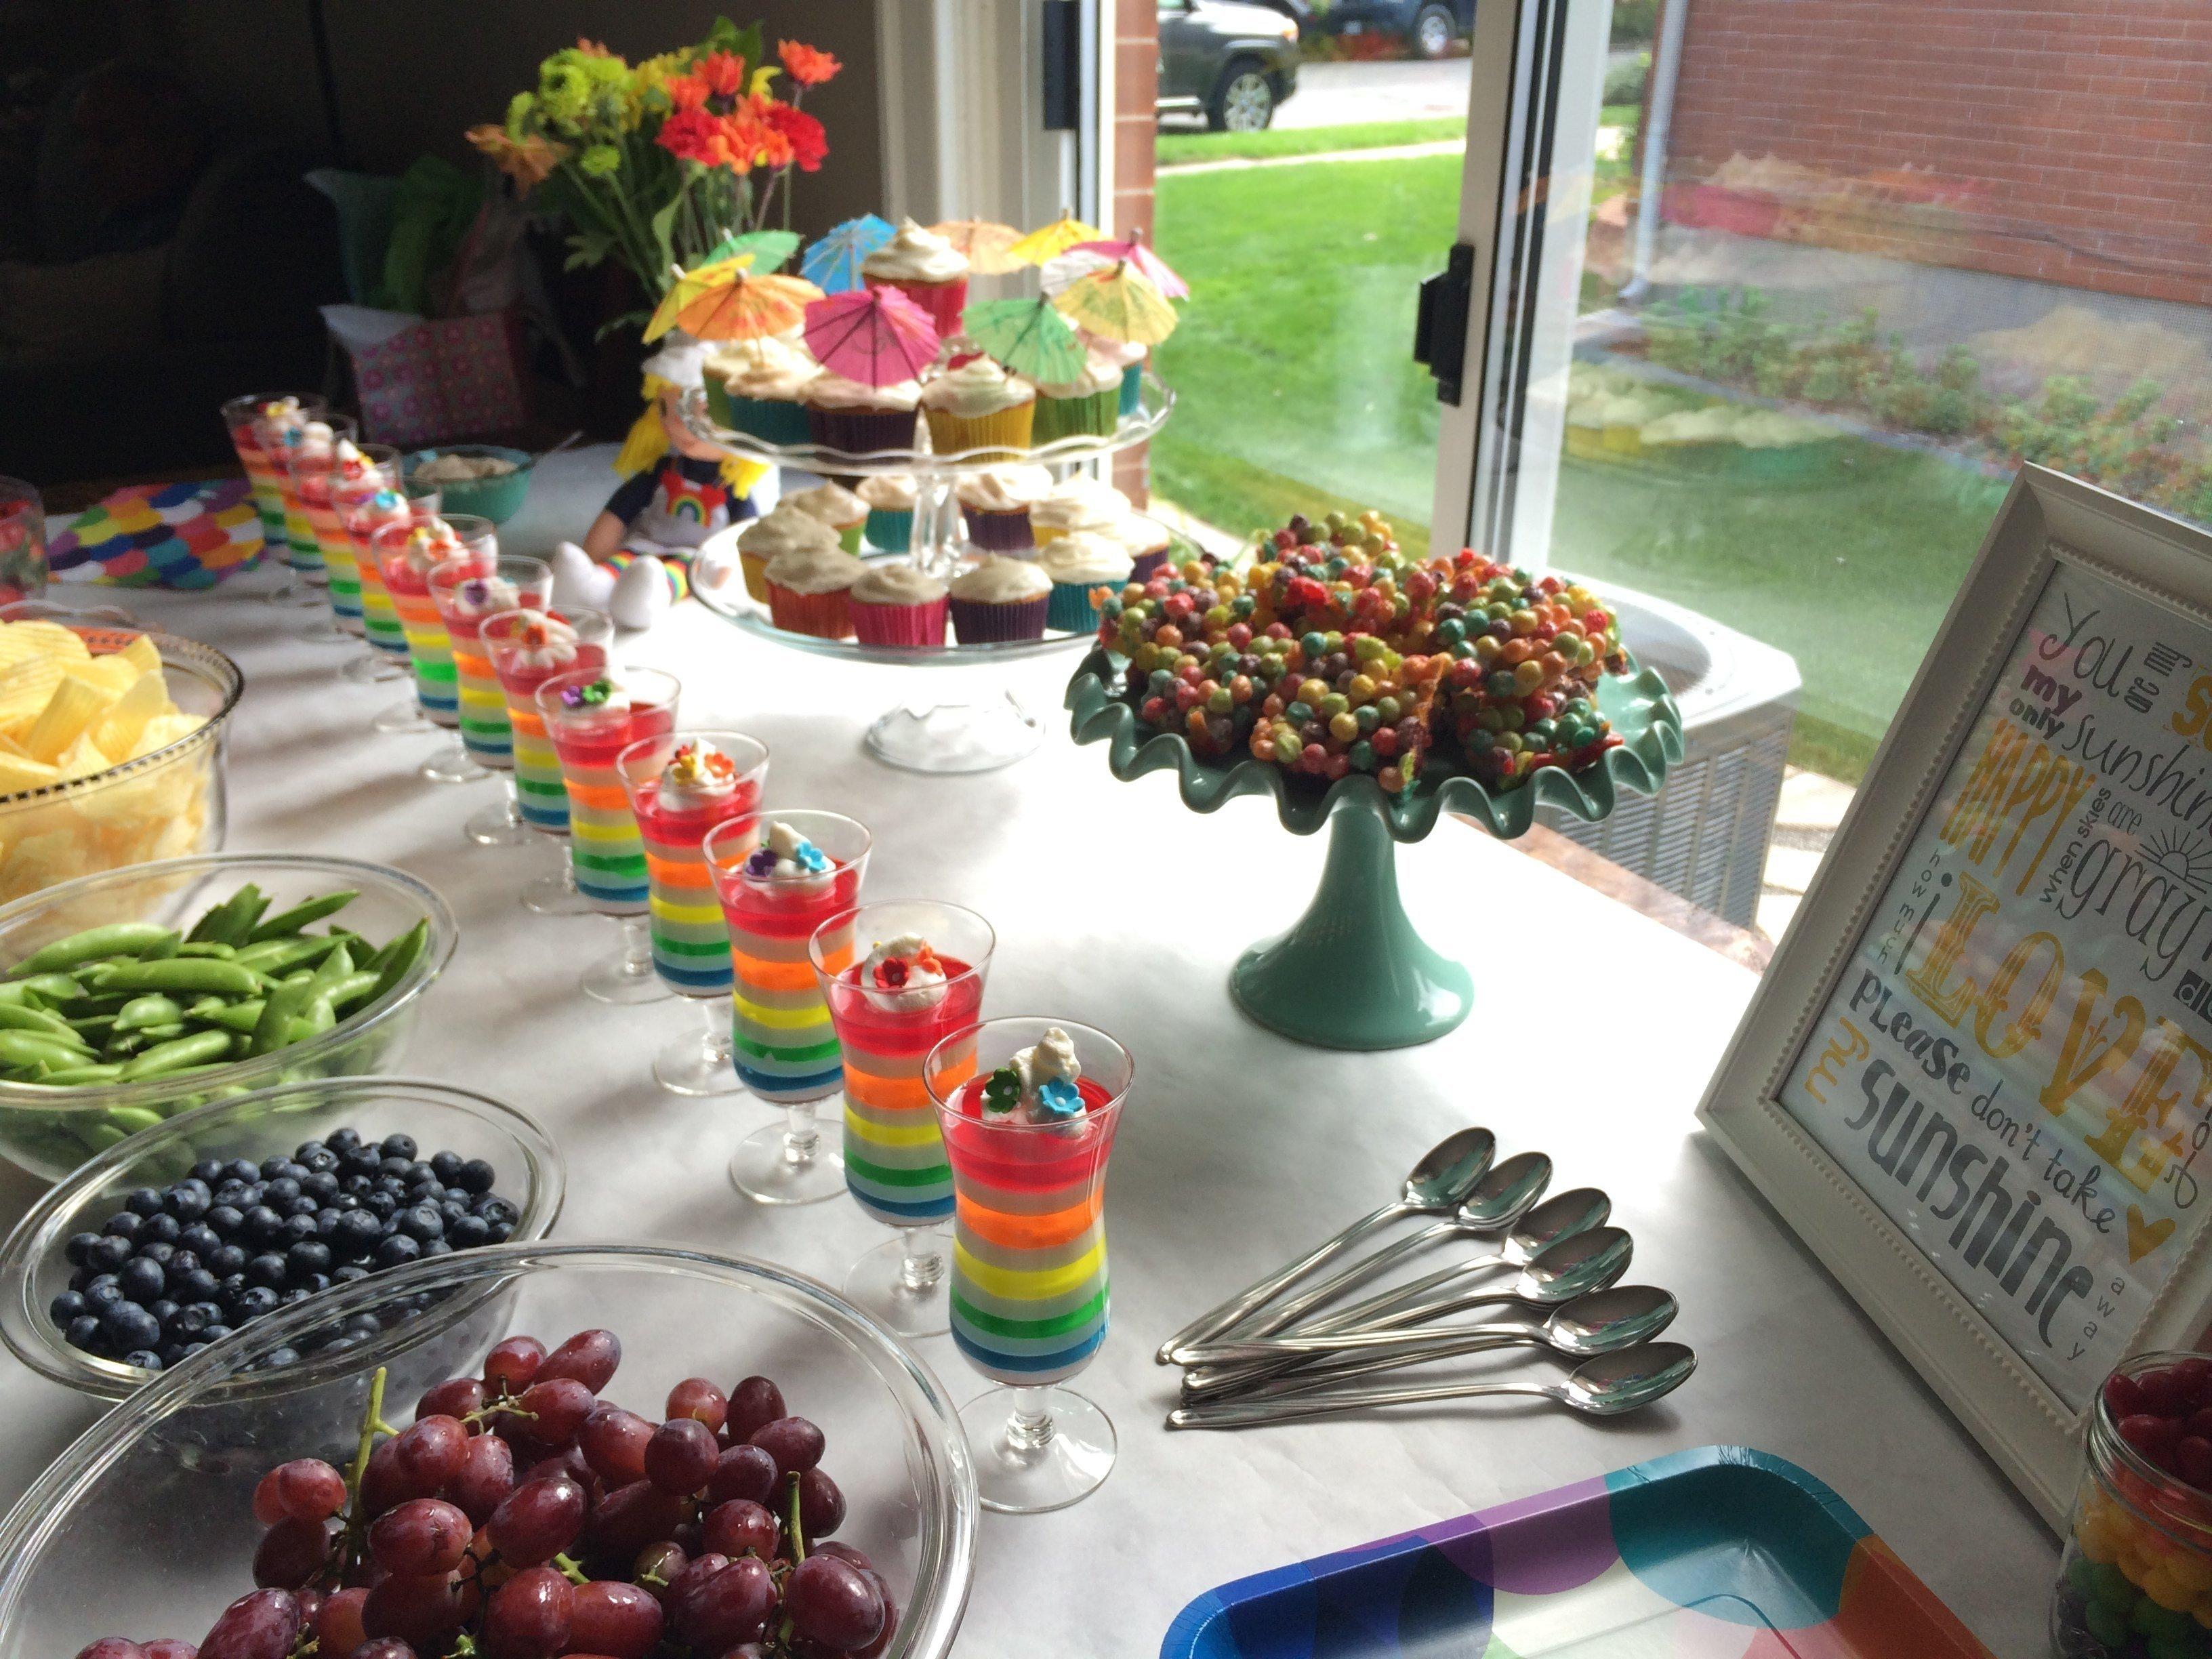 10 Lovely 4 Yr Old Boy Birthday Party Ideas easy birthday party ideas for 7 year old boy at home attractive 13 2021